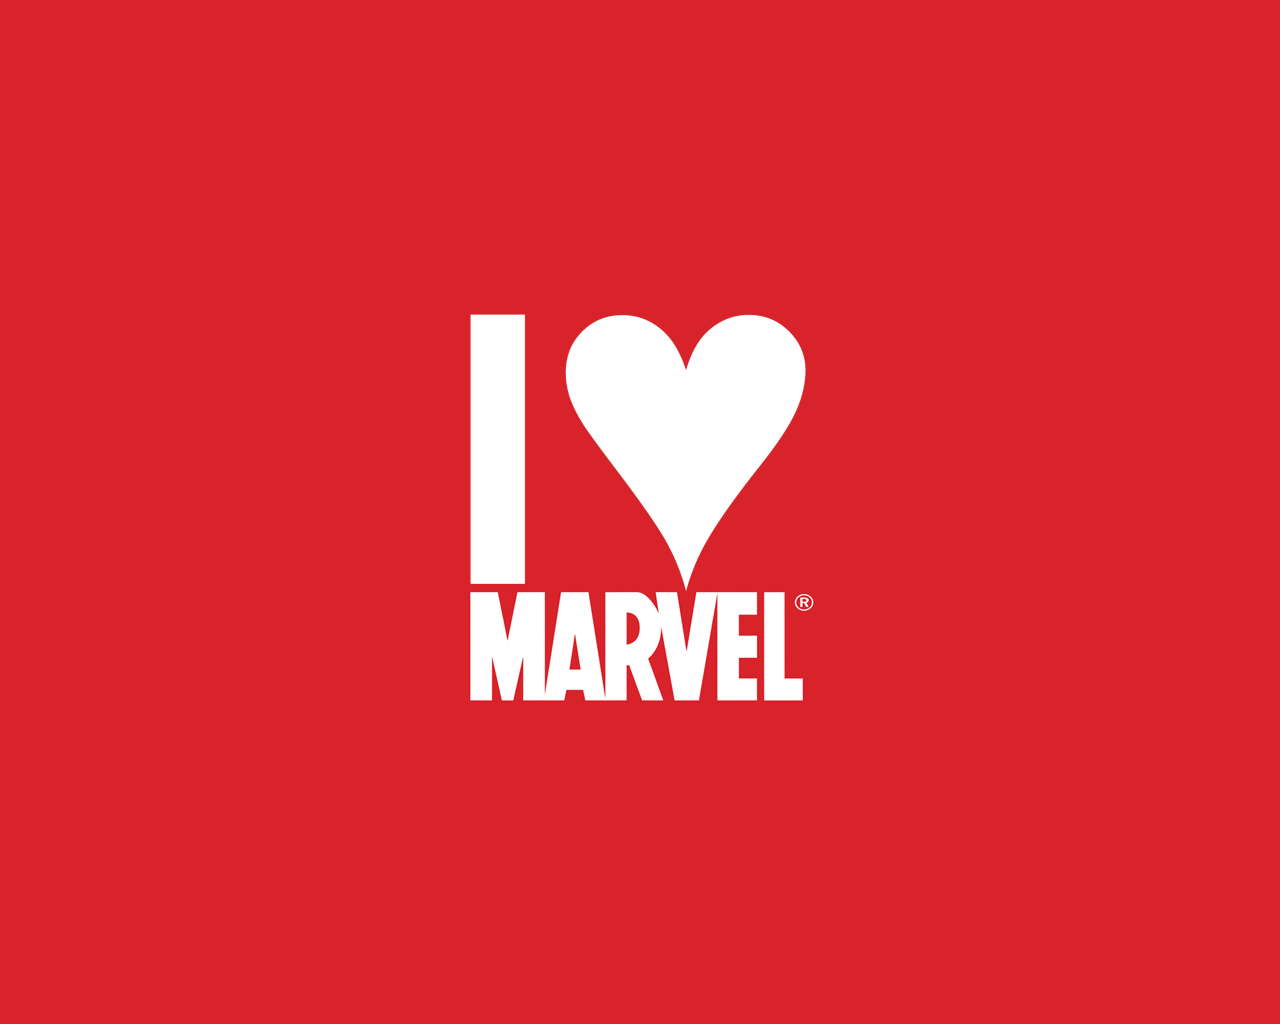 Marvel Logo Wallpaper Marvel wallpaper series   ilm 1280x1024